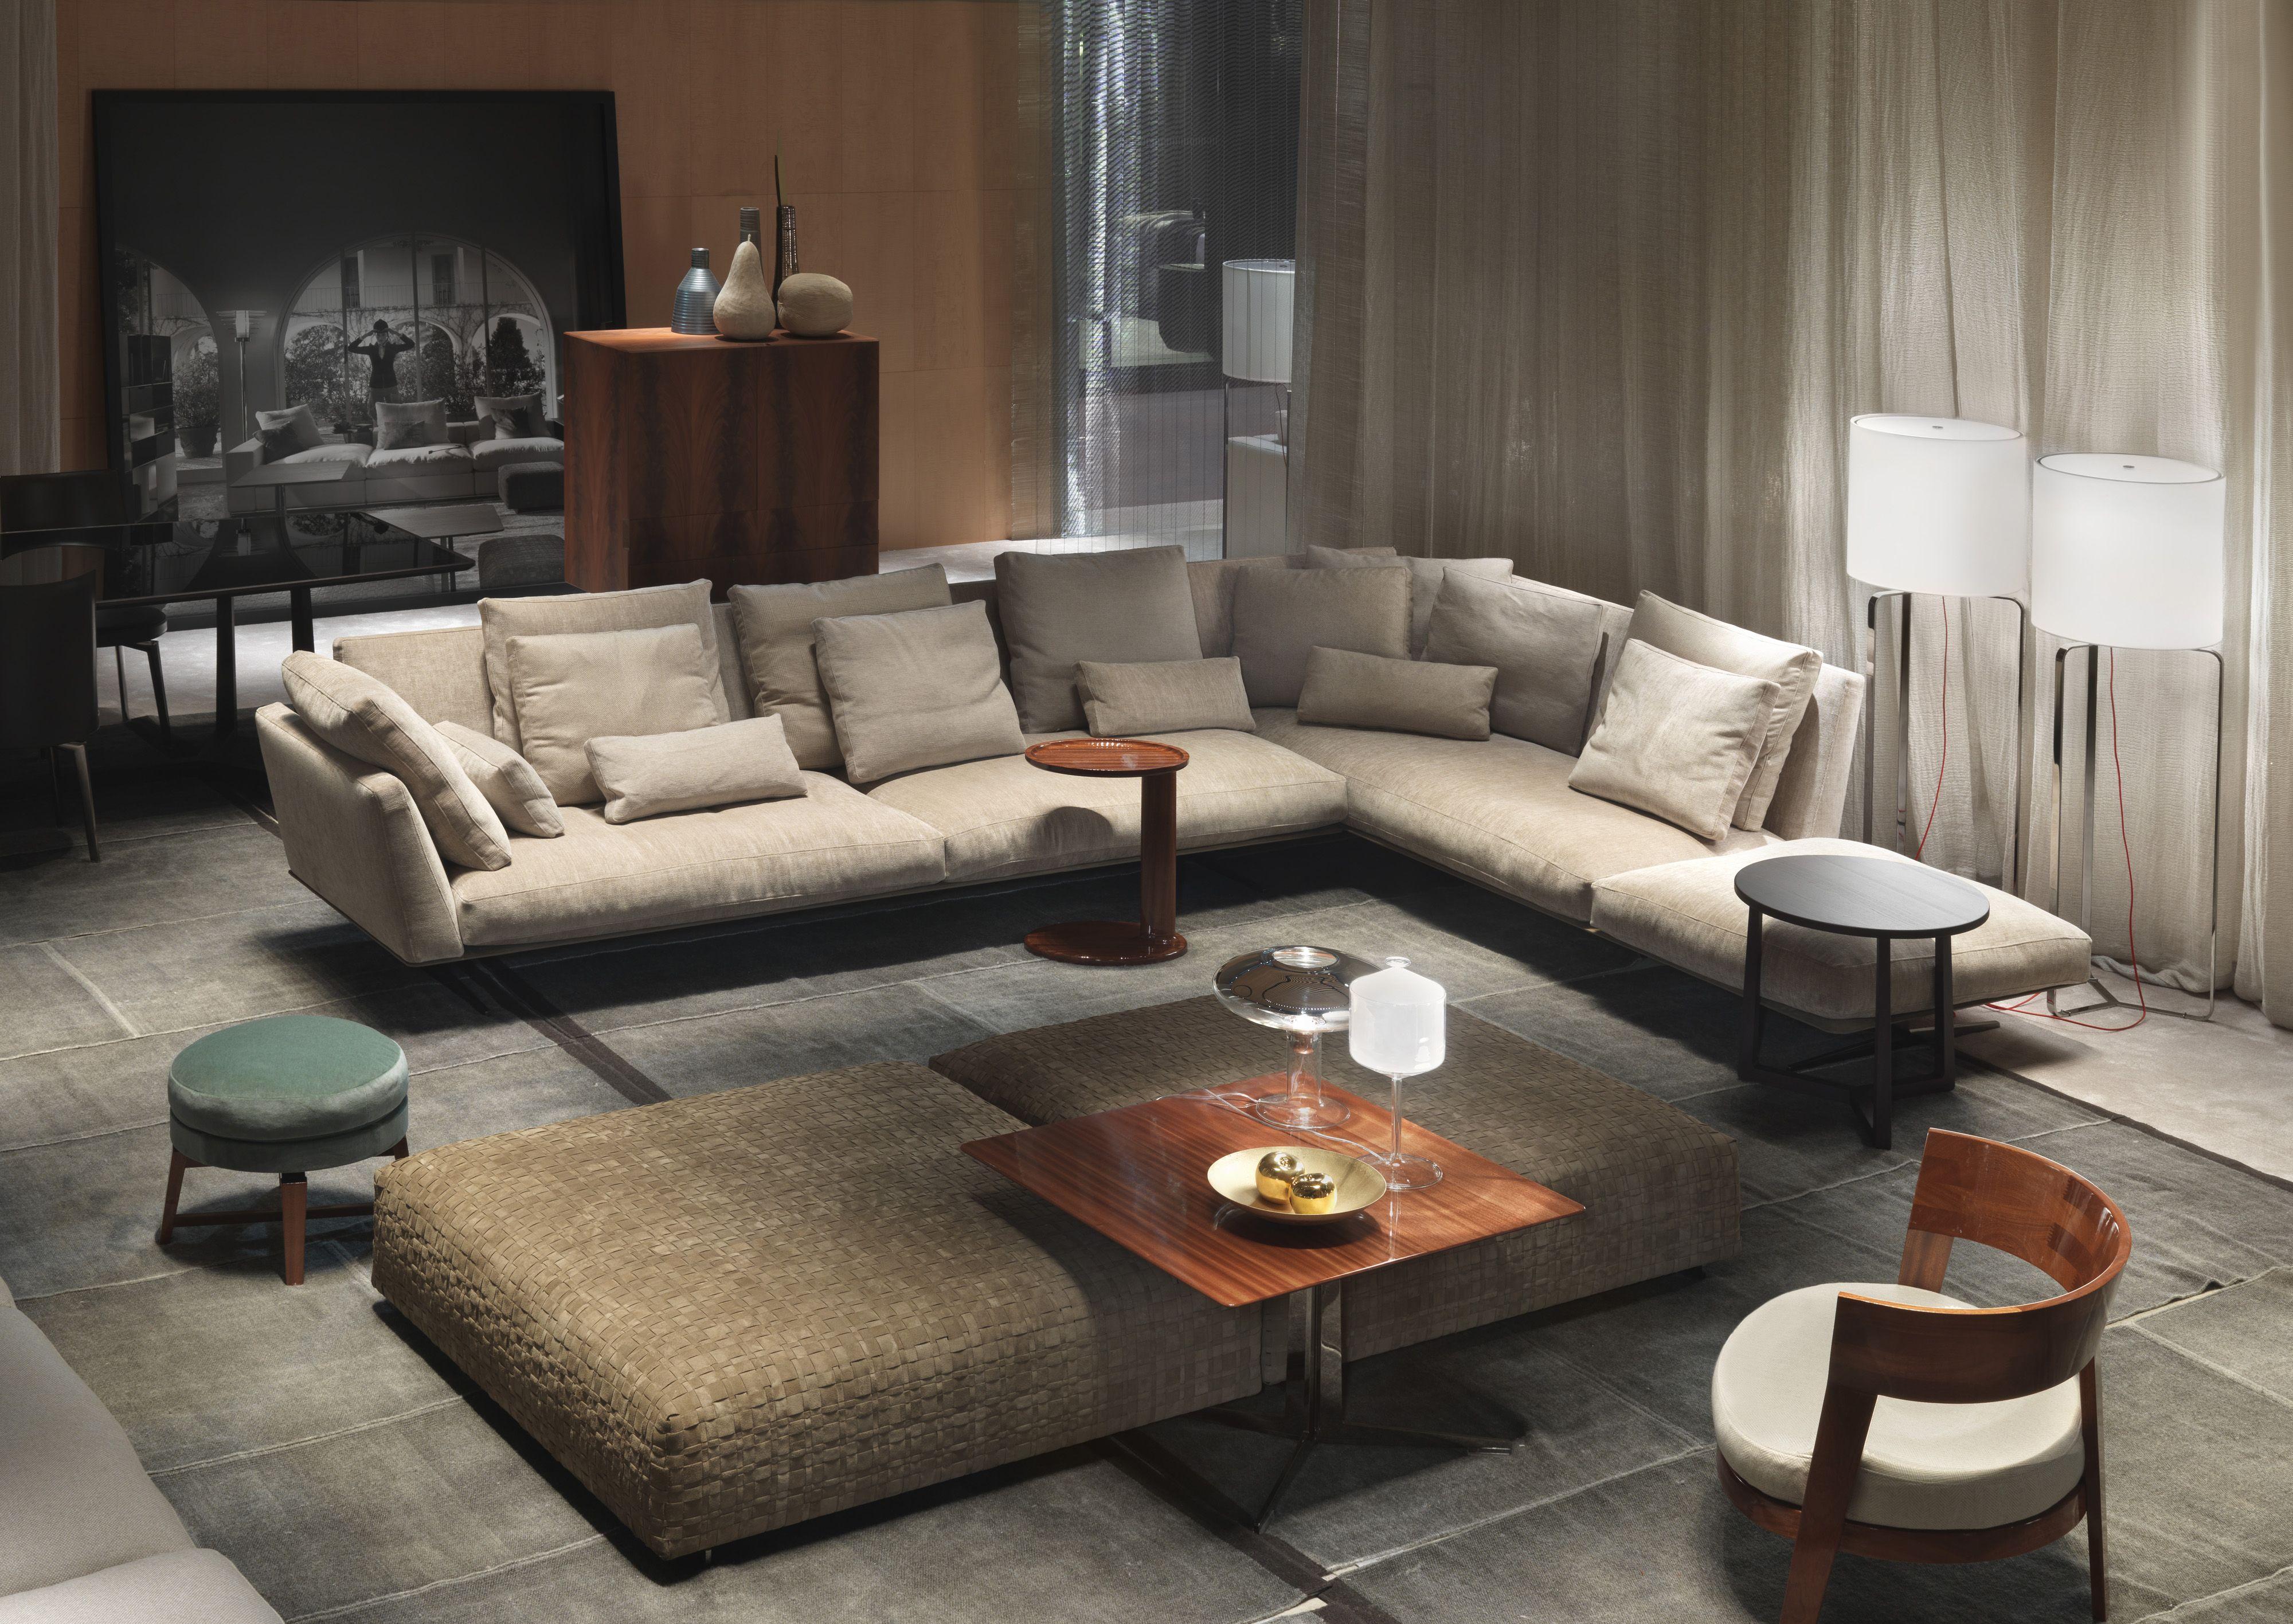 Modular sofa systems Seating Groundpiece Flexform